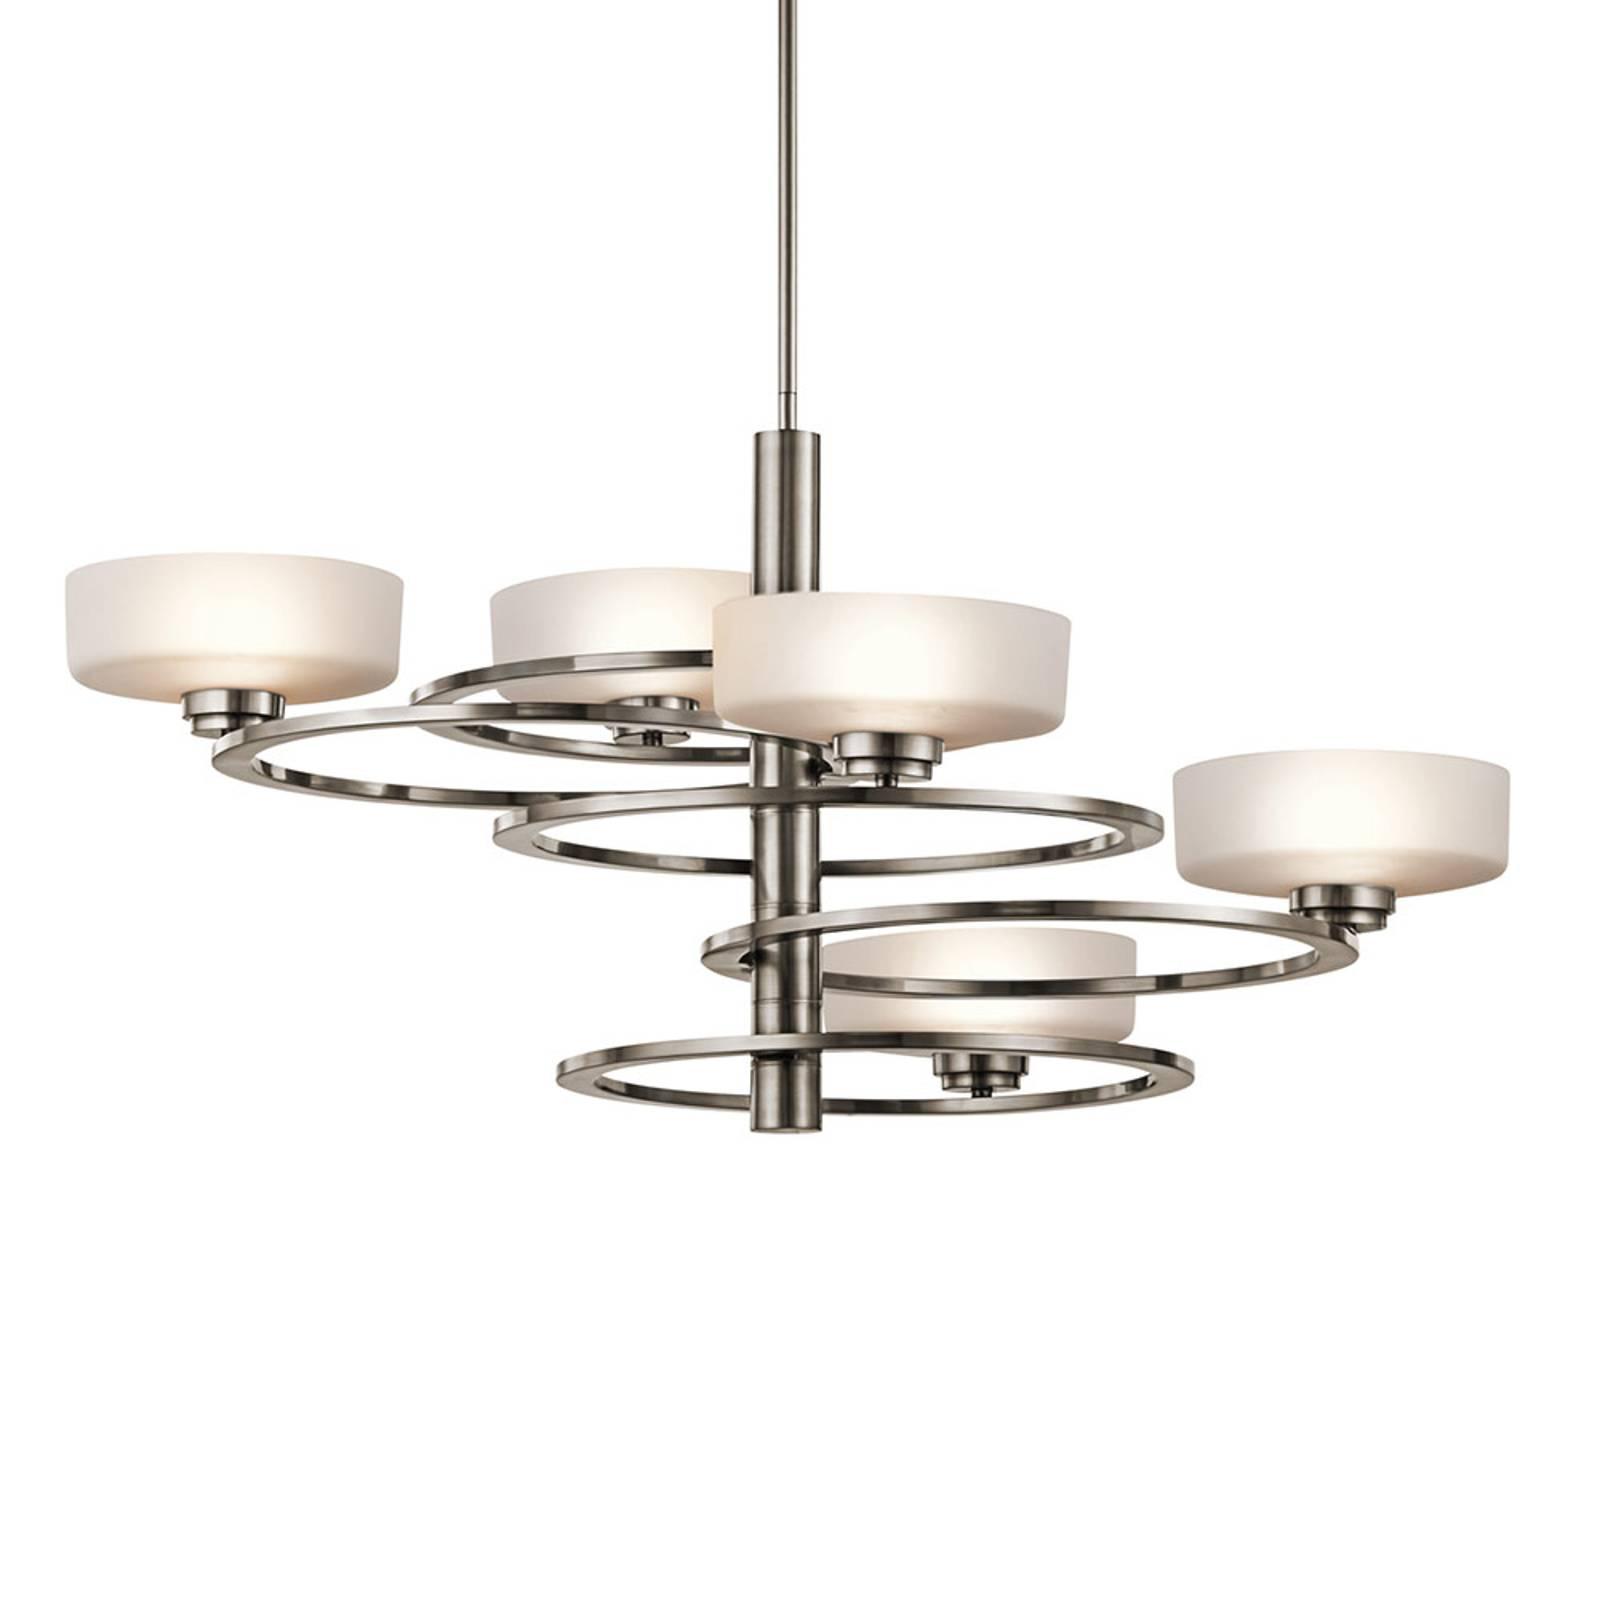 LED-riippuvalaisin Aleeka 5-lamp., 43,8 cm